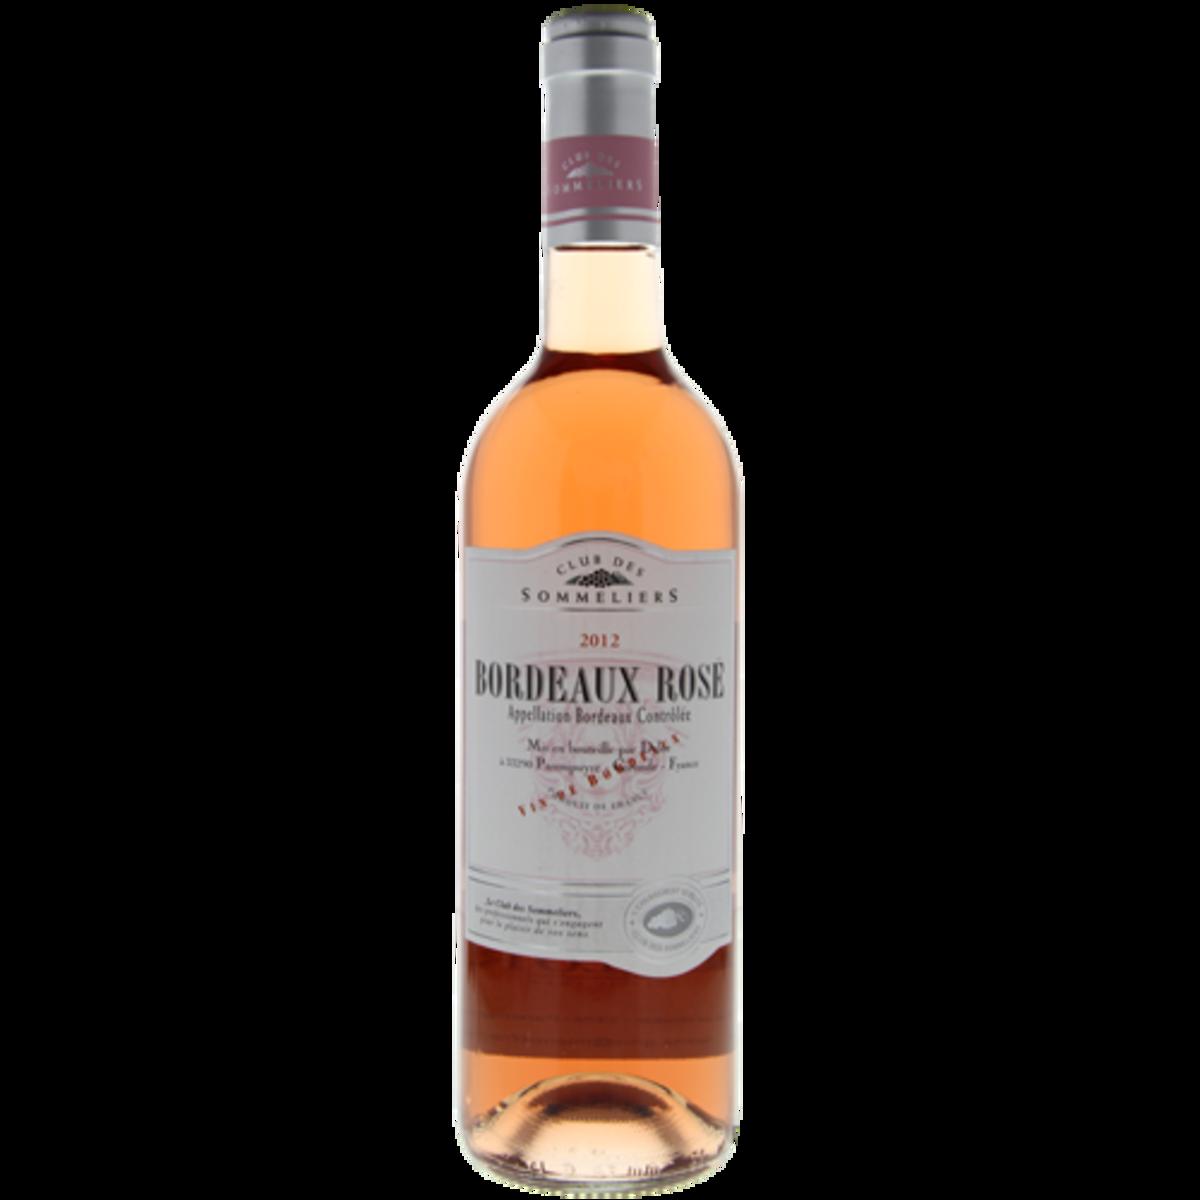 法國直送 - Bordeaux Rose Wine Club des Sommeliers (375ml)